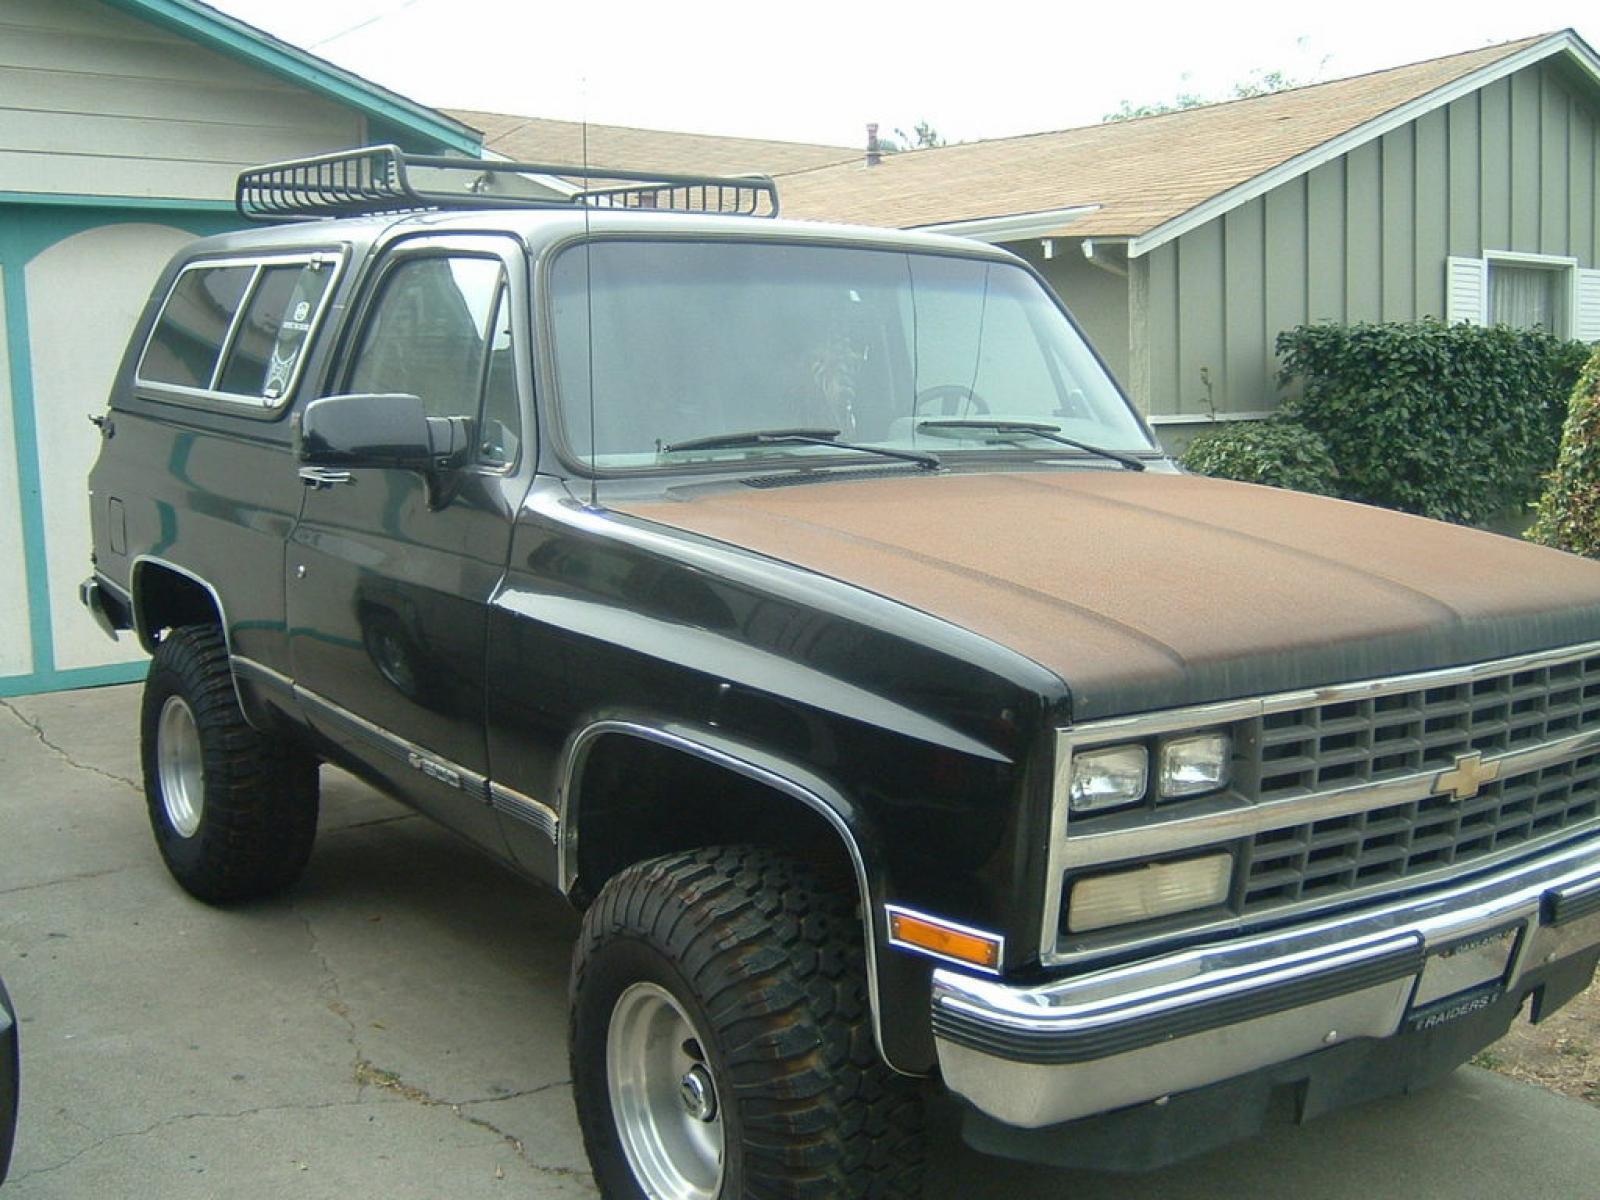 1991 chevrolet blazer information and photos zomb drive Chevy K5 Blazer